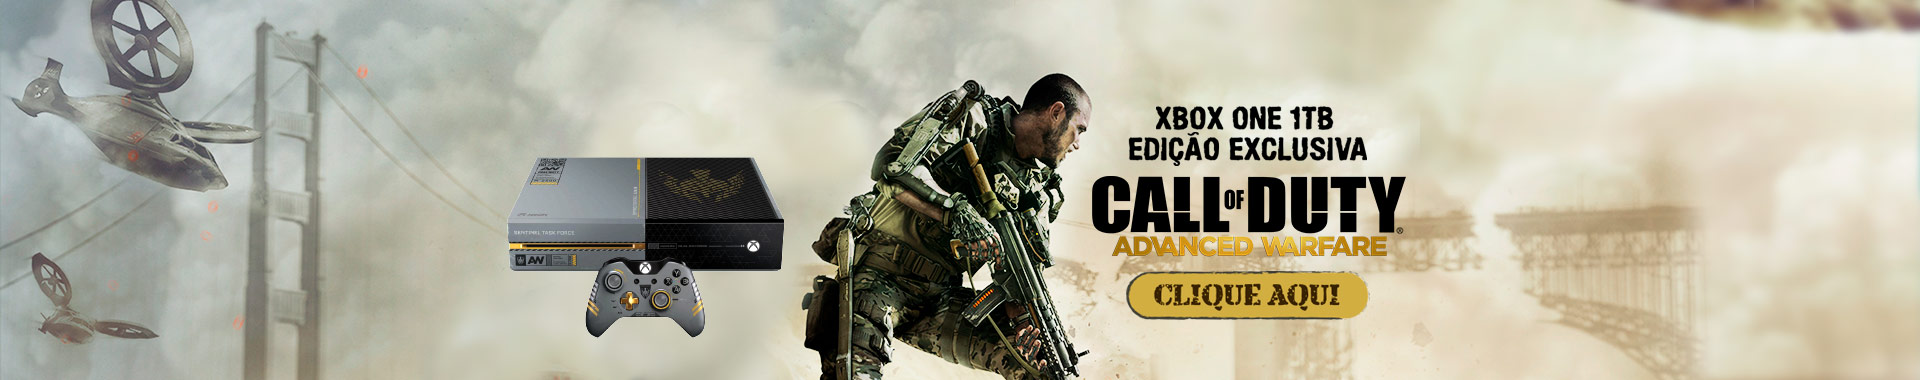 Xbox One Especial